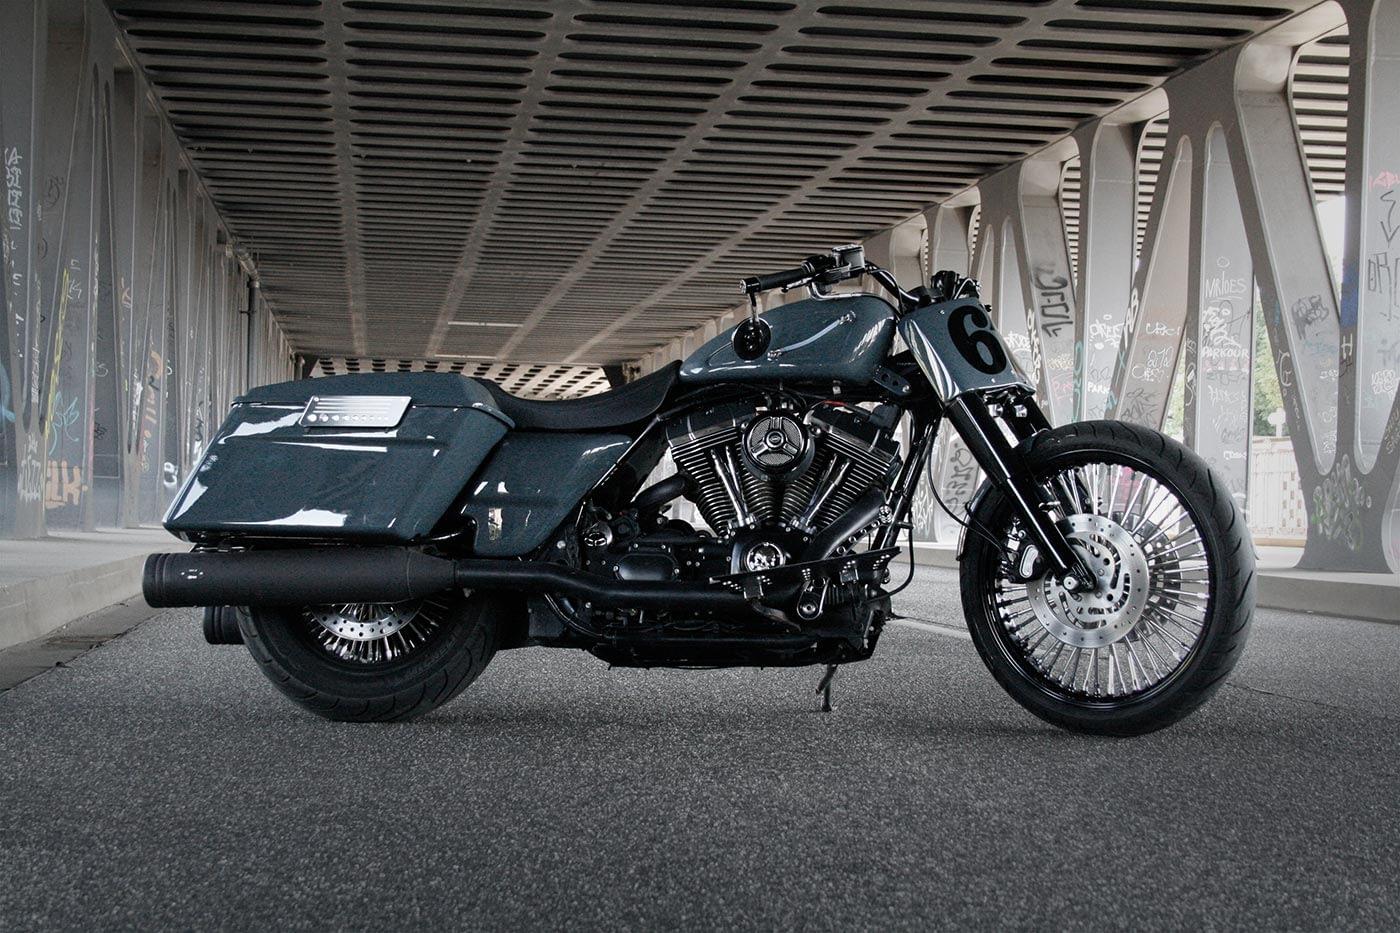 Harley-Davidson Roadking - Streetglide Dunkelgrau